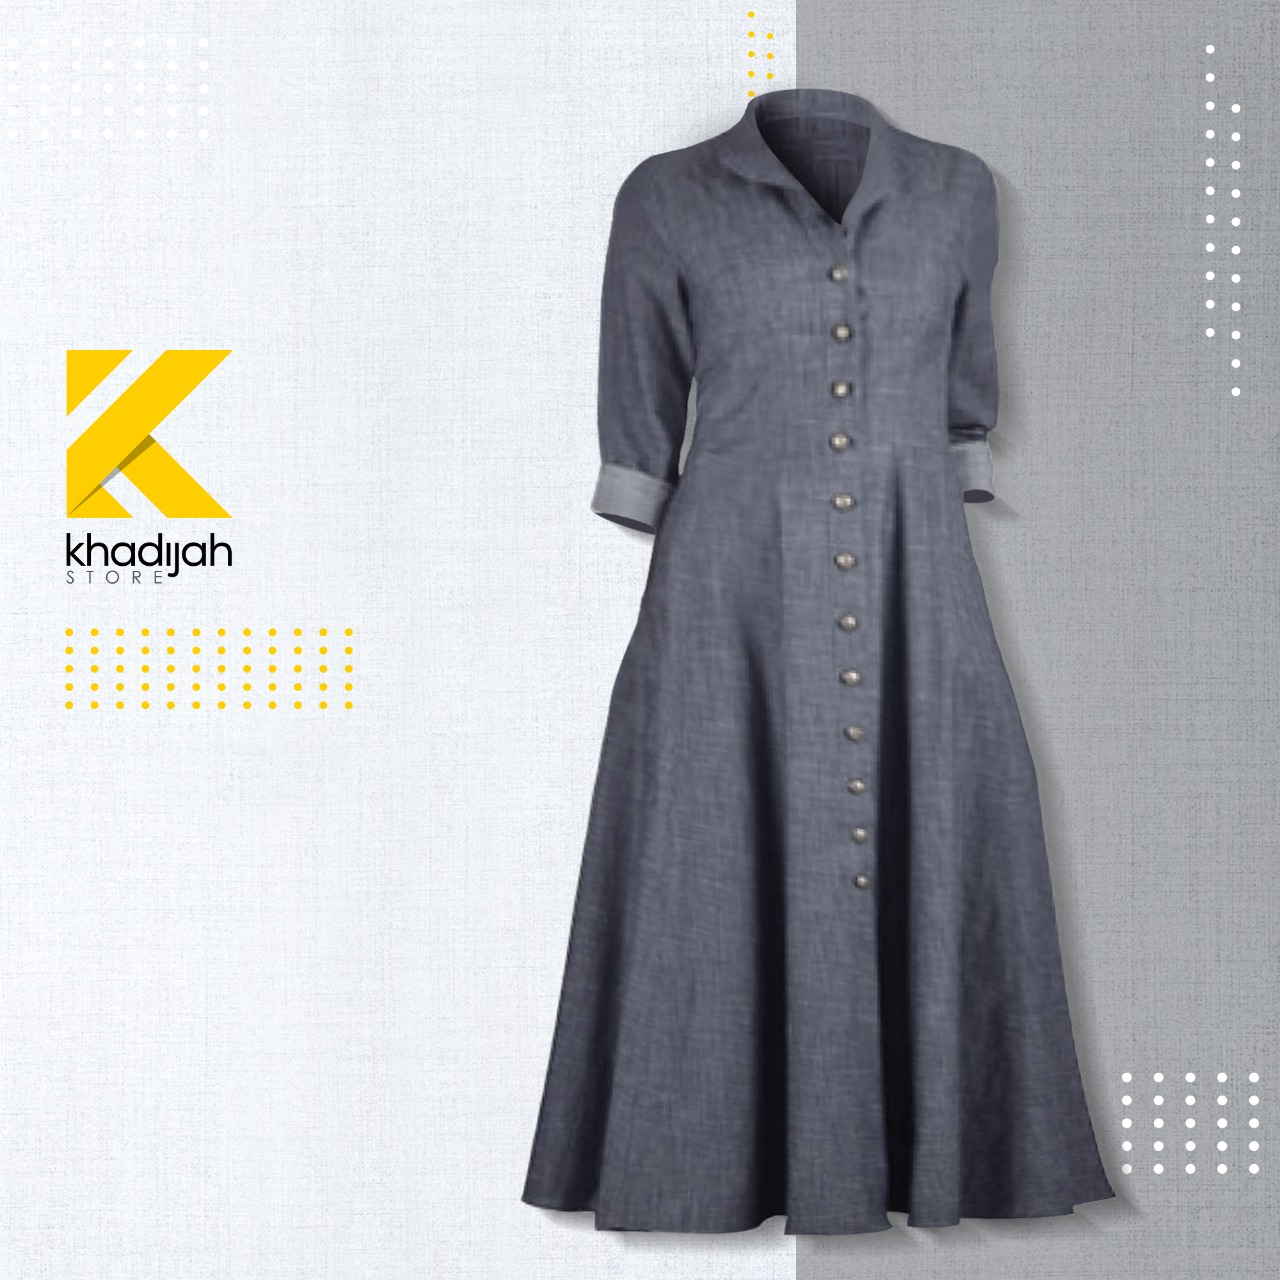 KHADIJAH STORE - New Style & Trending Muslim Wear Maxican Style Denim Abaya for Girls